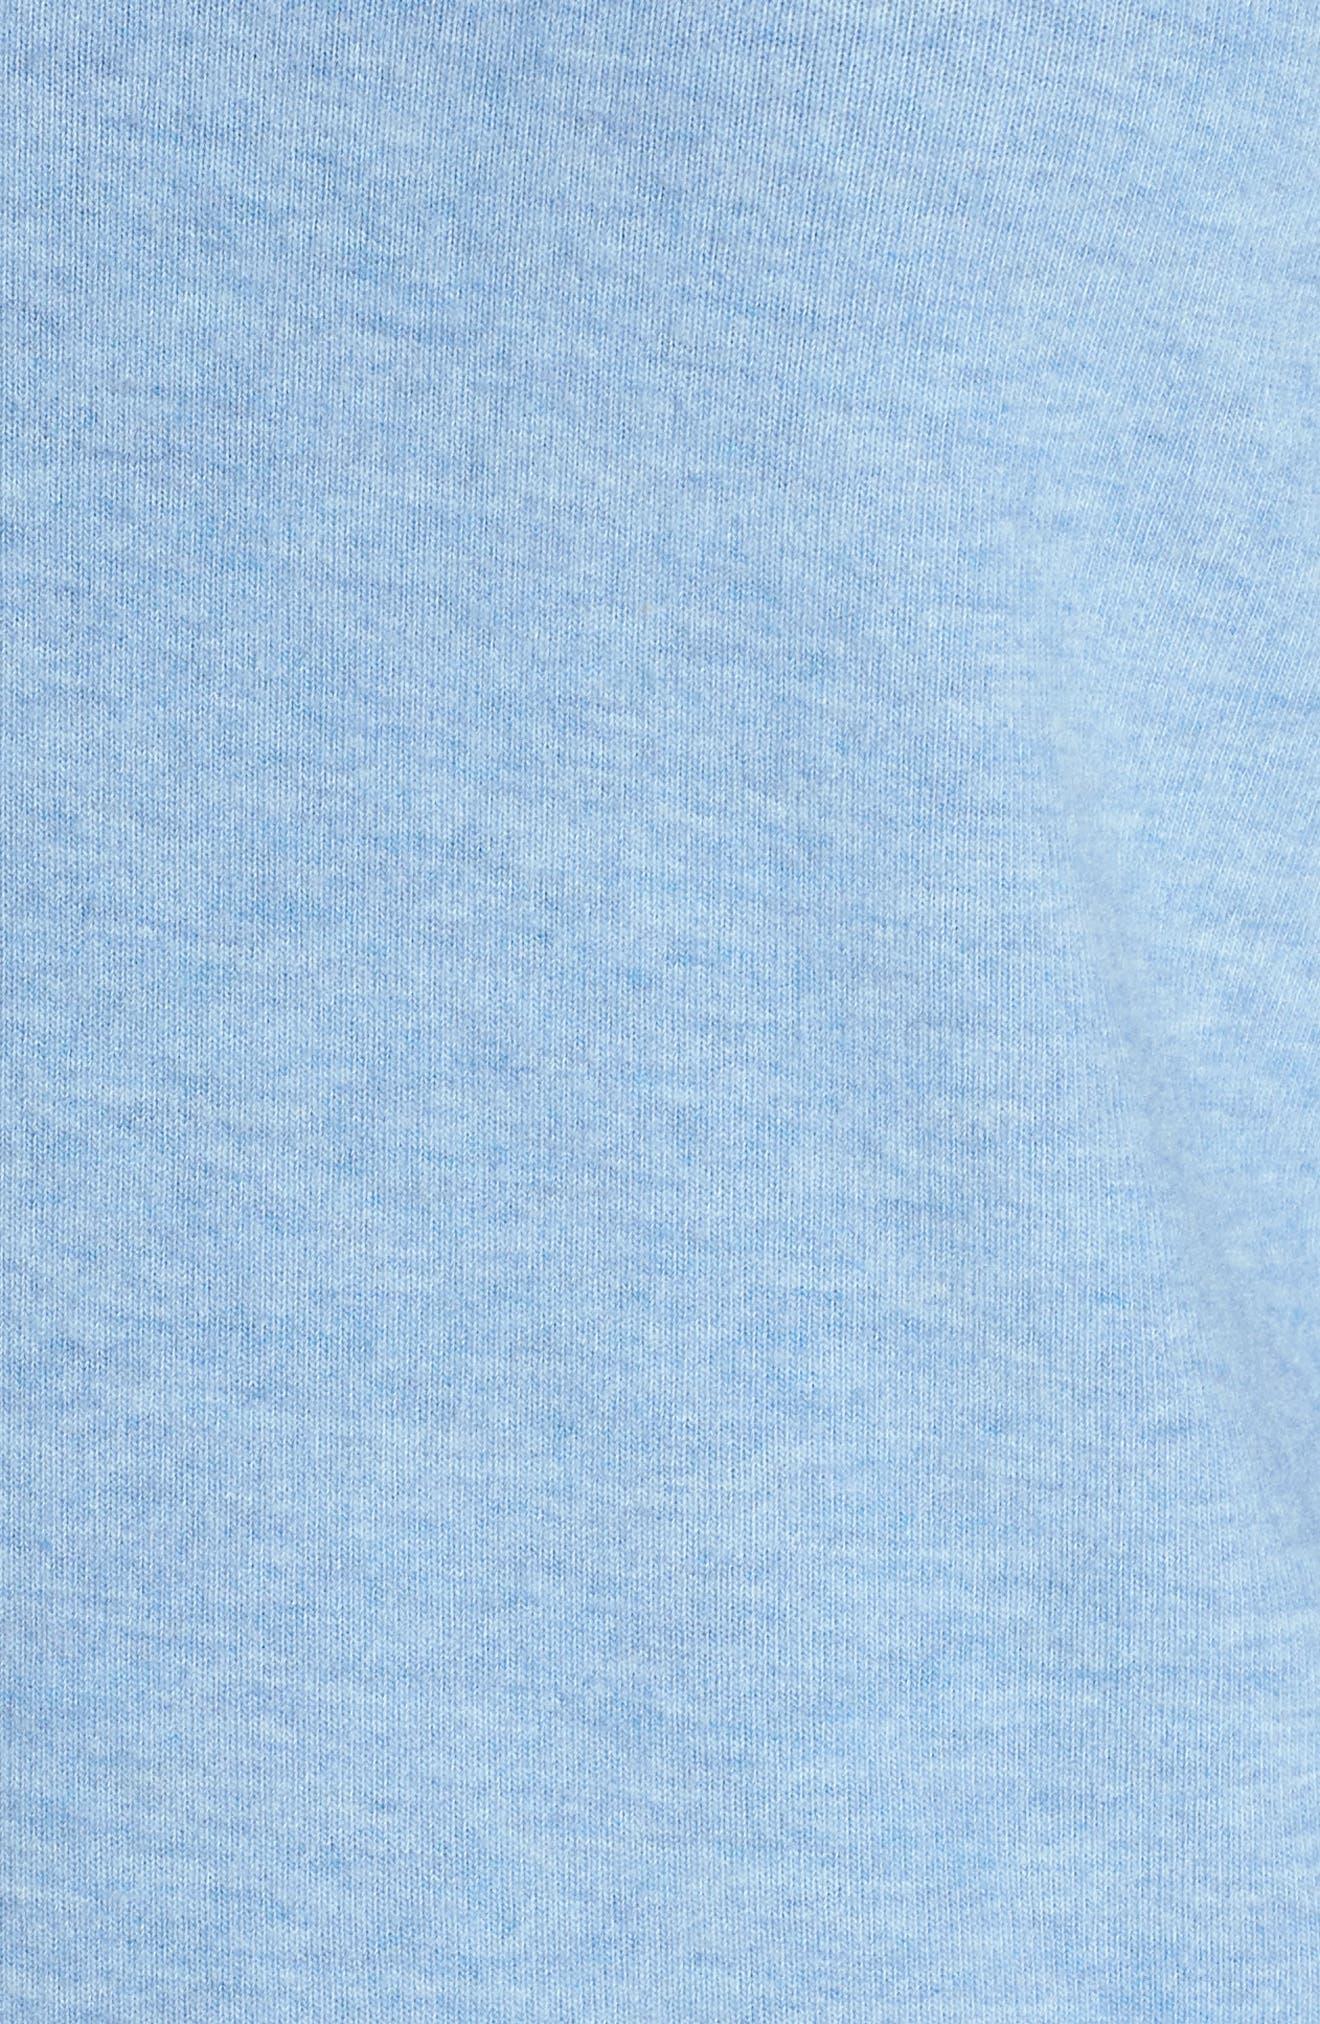 Peachy Pajama Shirt,                             Alternate thumbnail 8, color,                             Blue